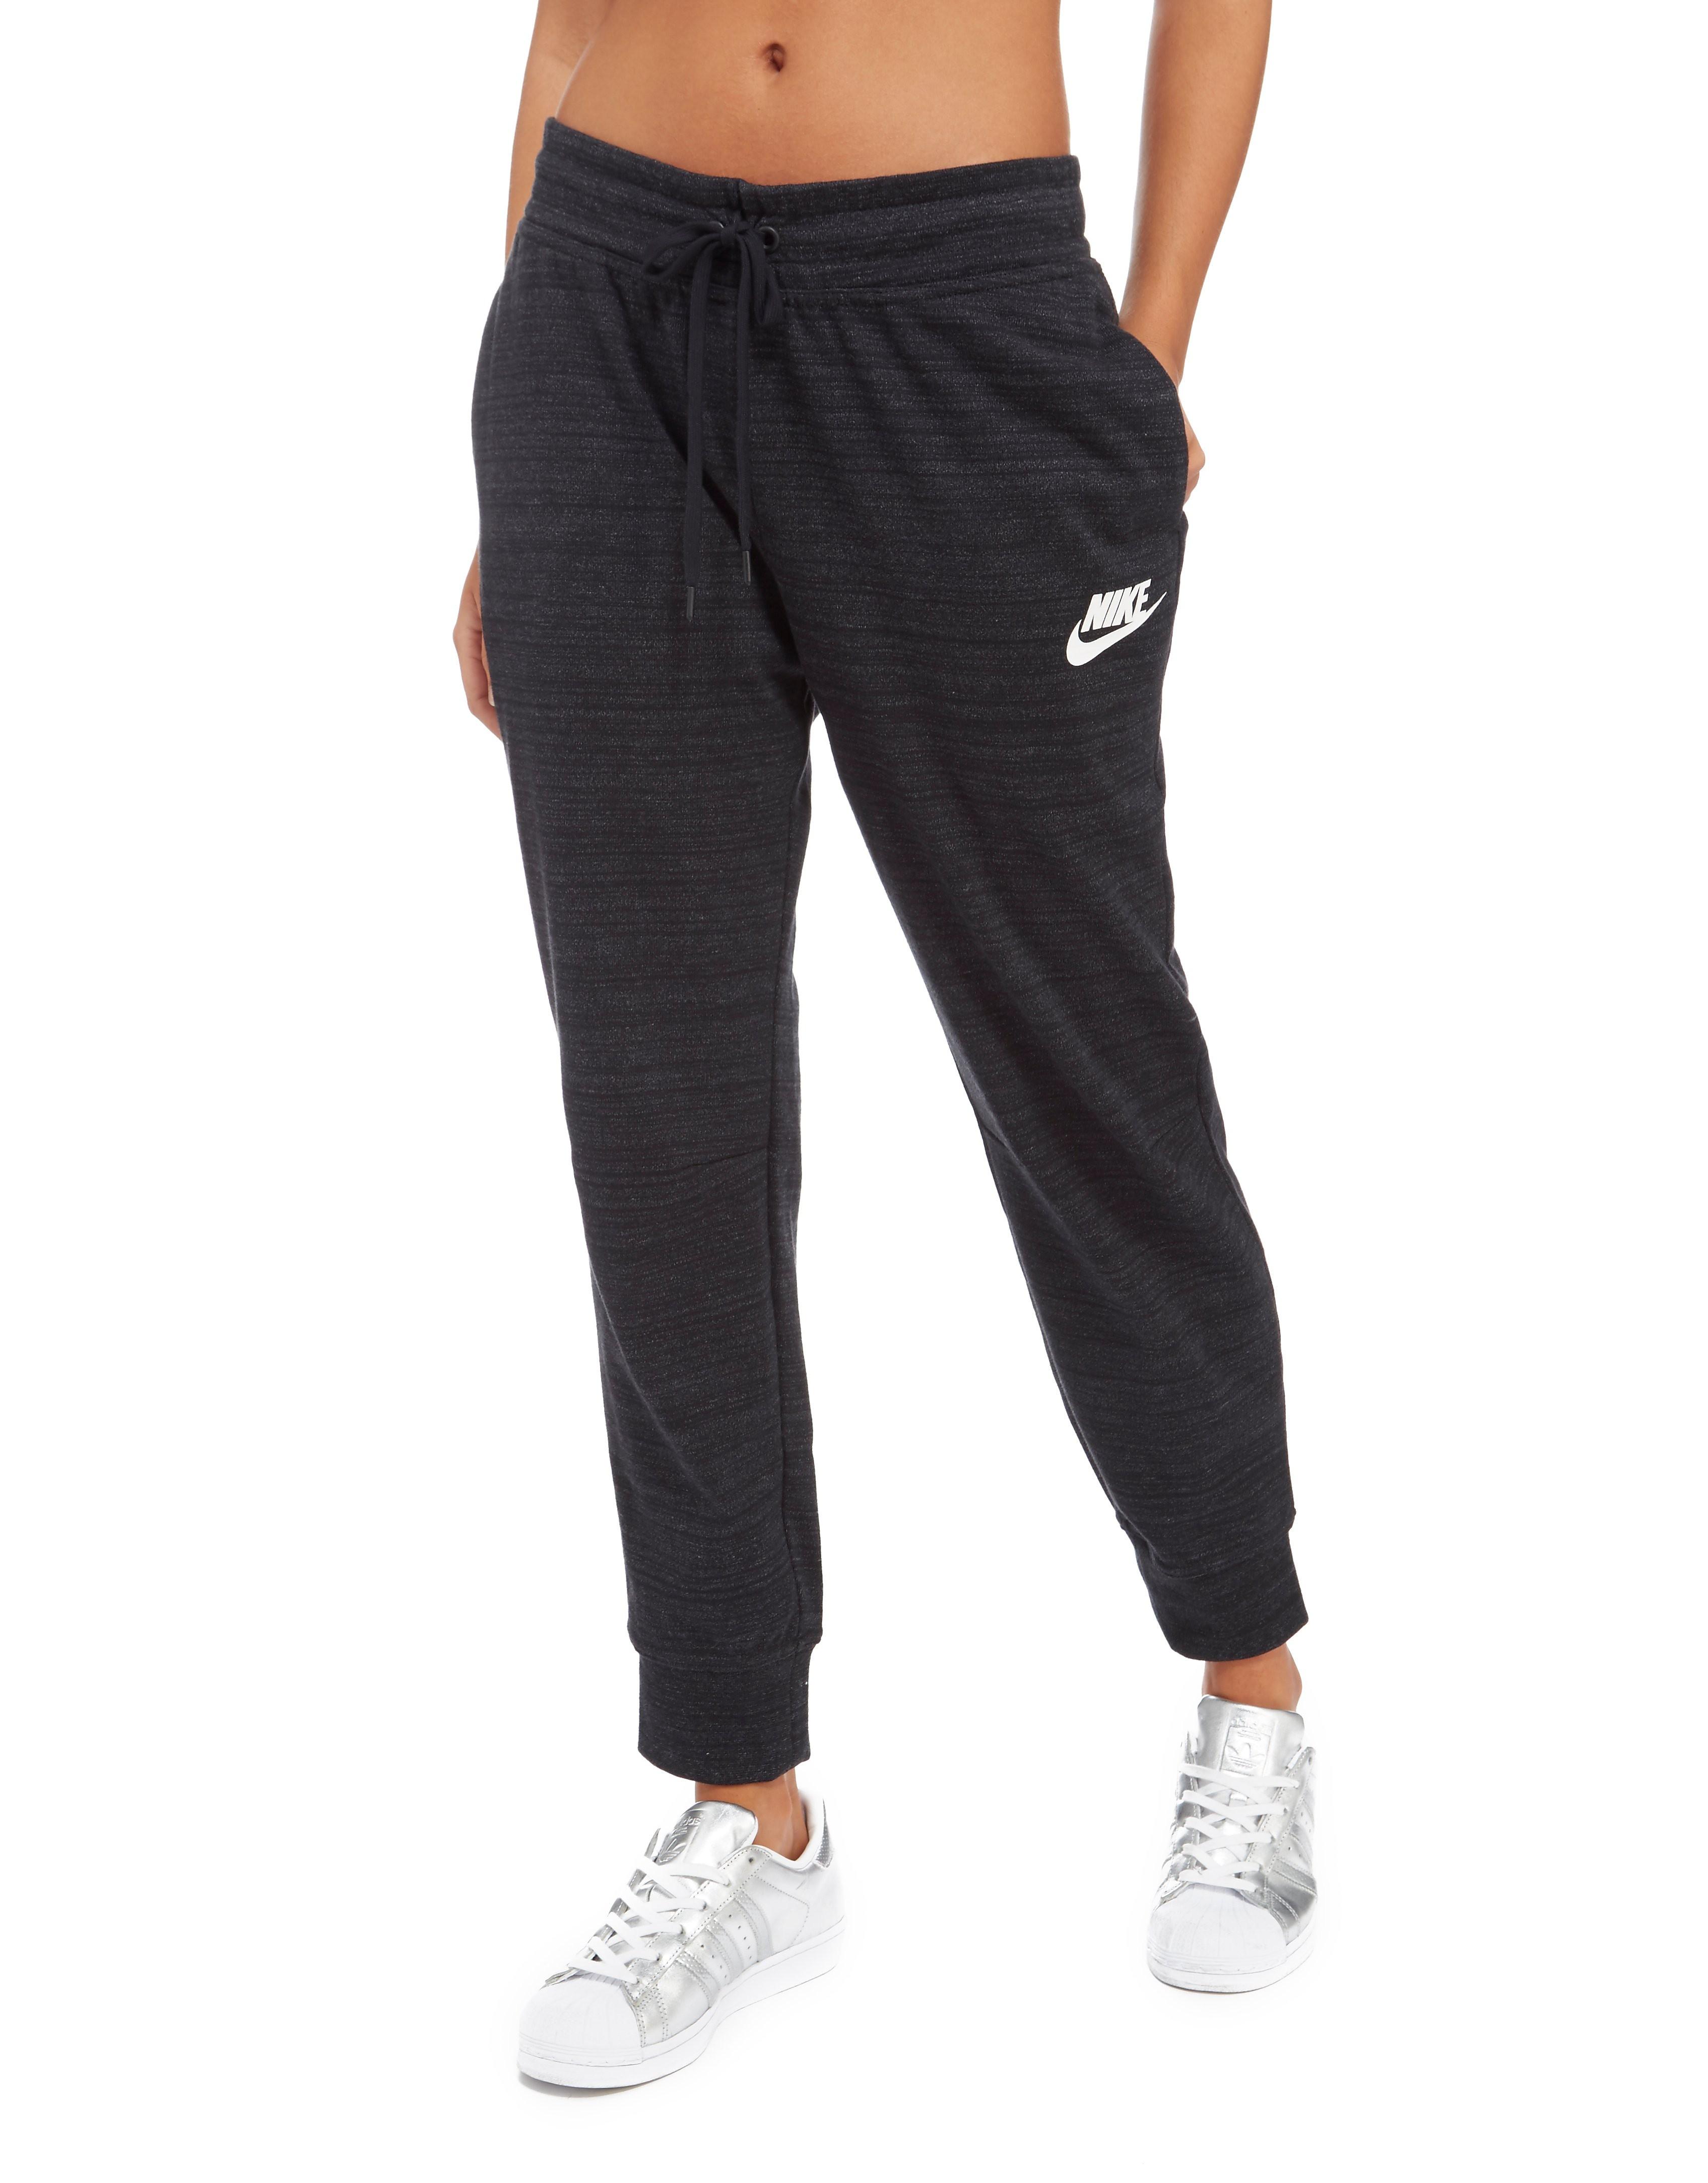 Nike Advance Jogging Pants